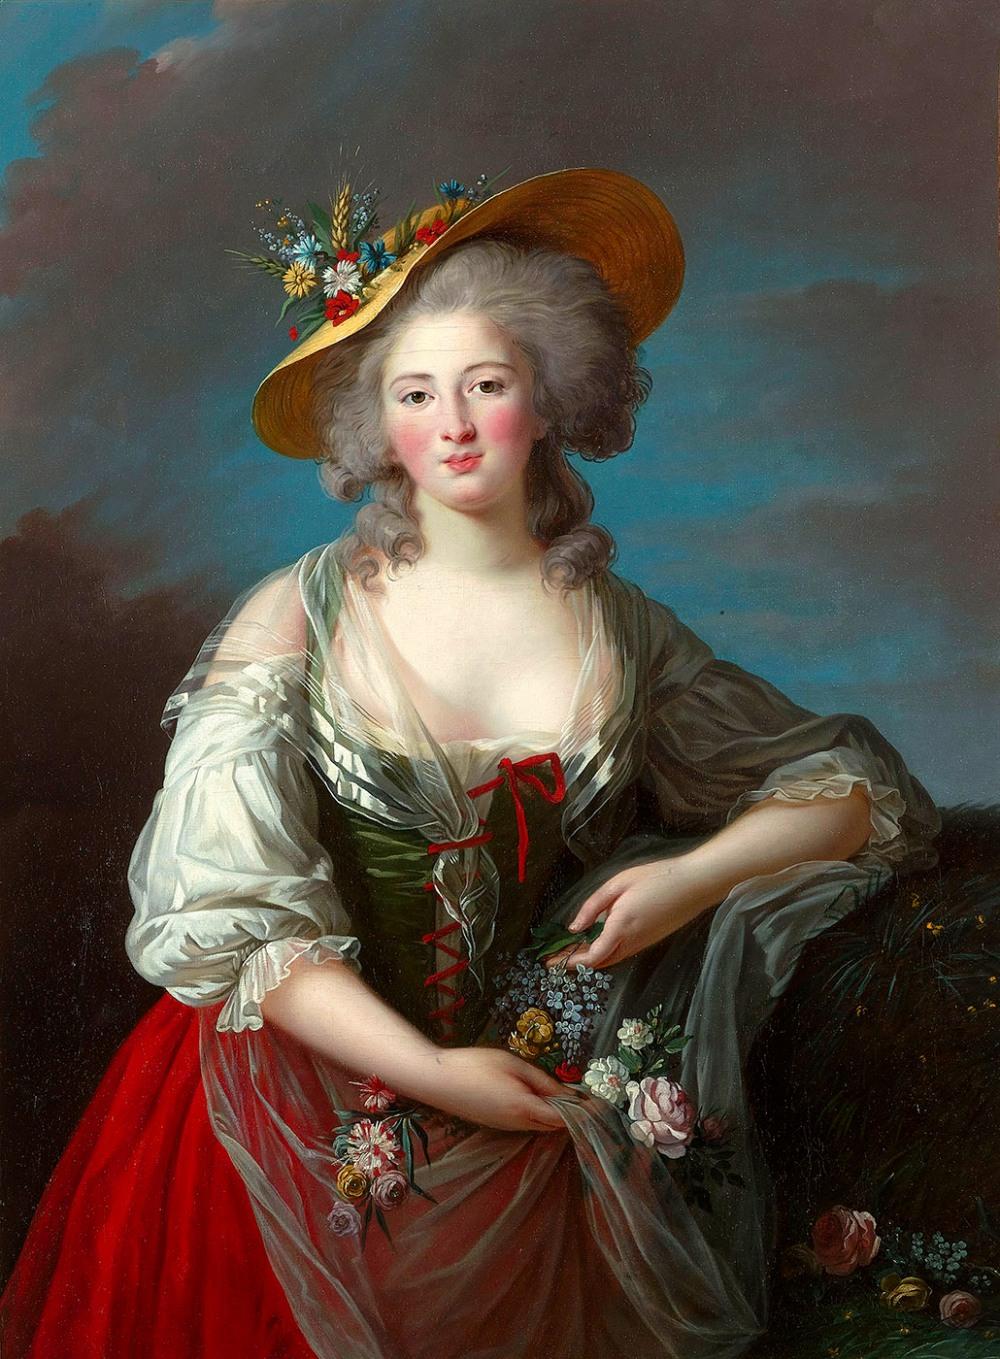 Marie Louise Élisabeth Vigée-Lebrun. Princesa Élisabeth de Francia.Hacia 1782. Palacio de Versalles.